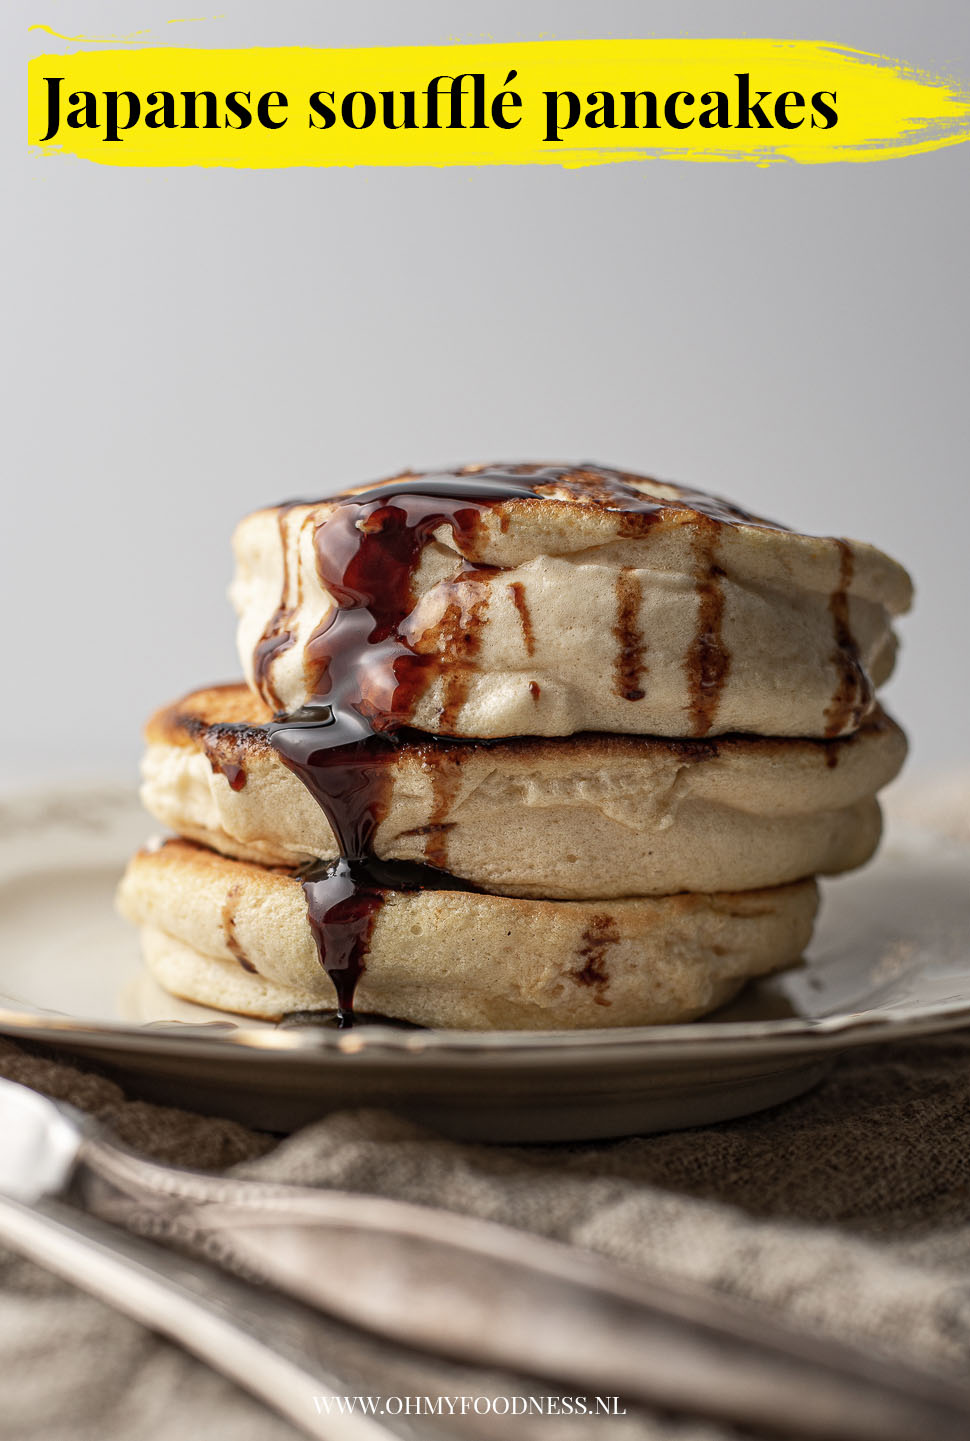 Japanse souffle pancakes